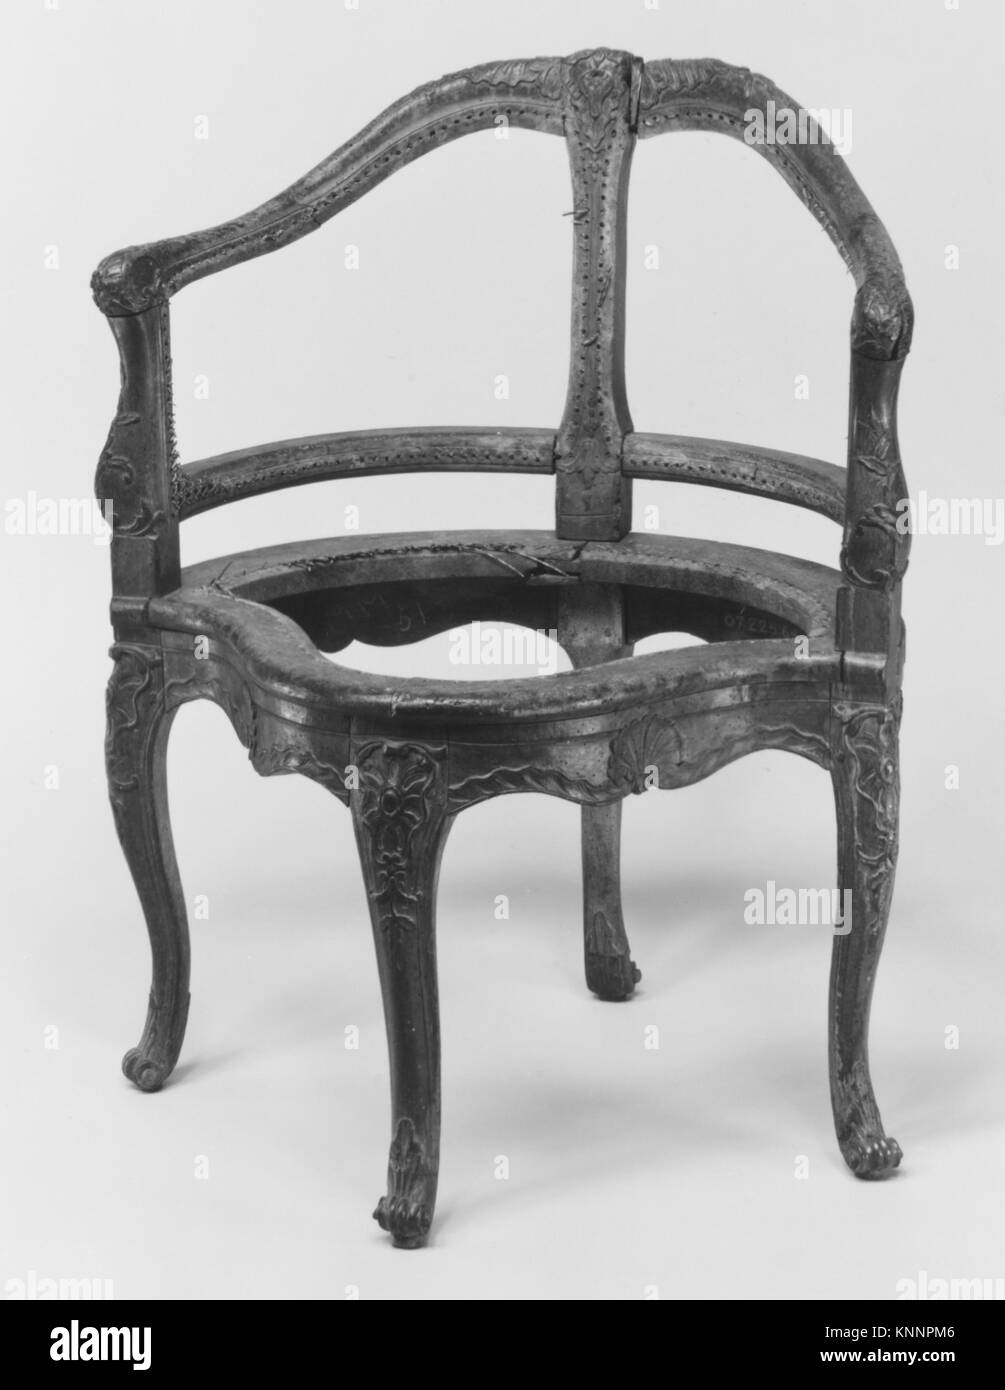 Stuhl Fauteuil De Bureau MET 226339 Schreibtisch 189348 Franzosisch Schreibtischstuhl